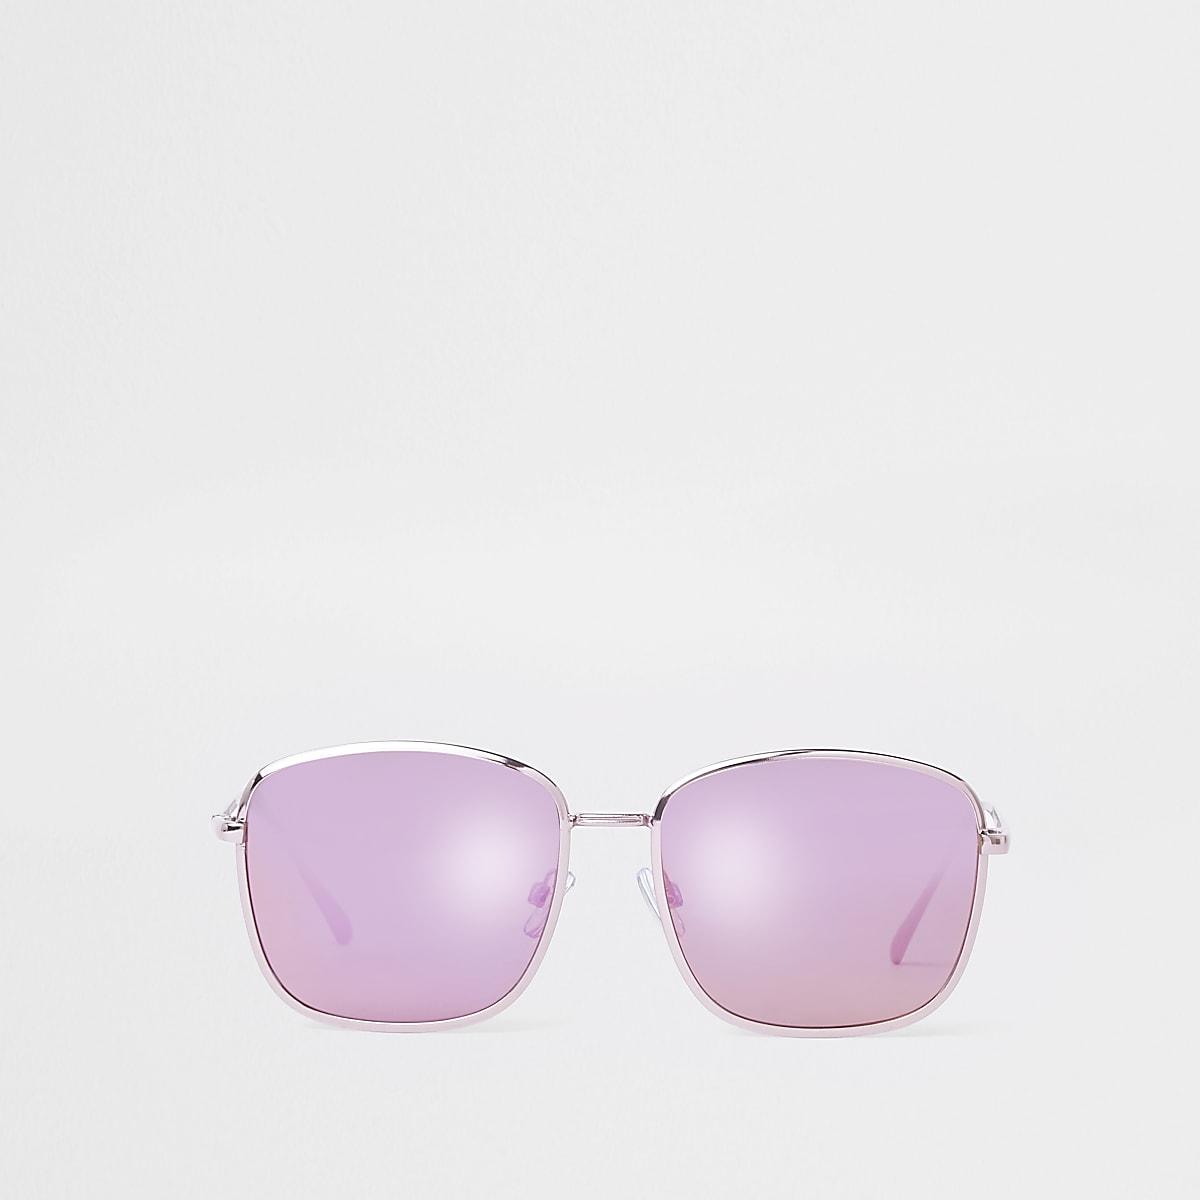 Pink square aviator sunglasses